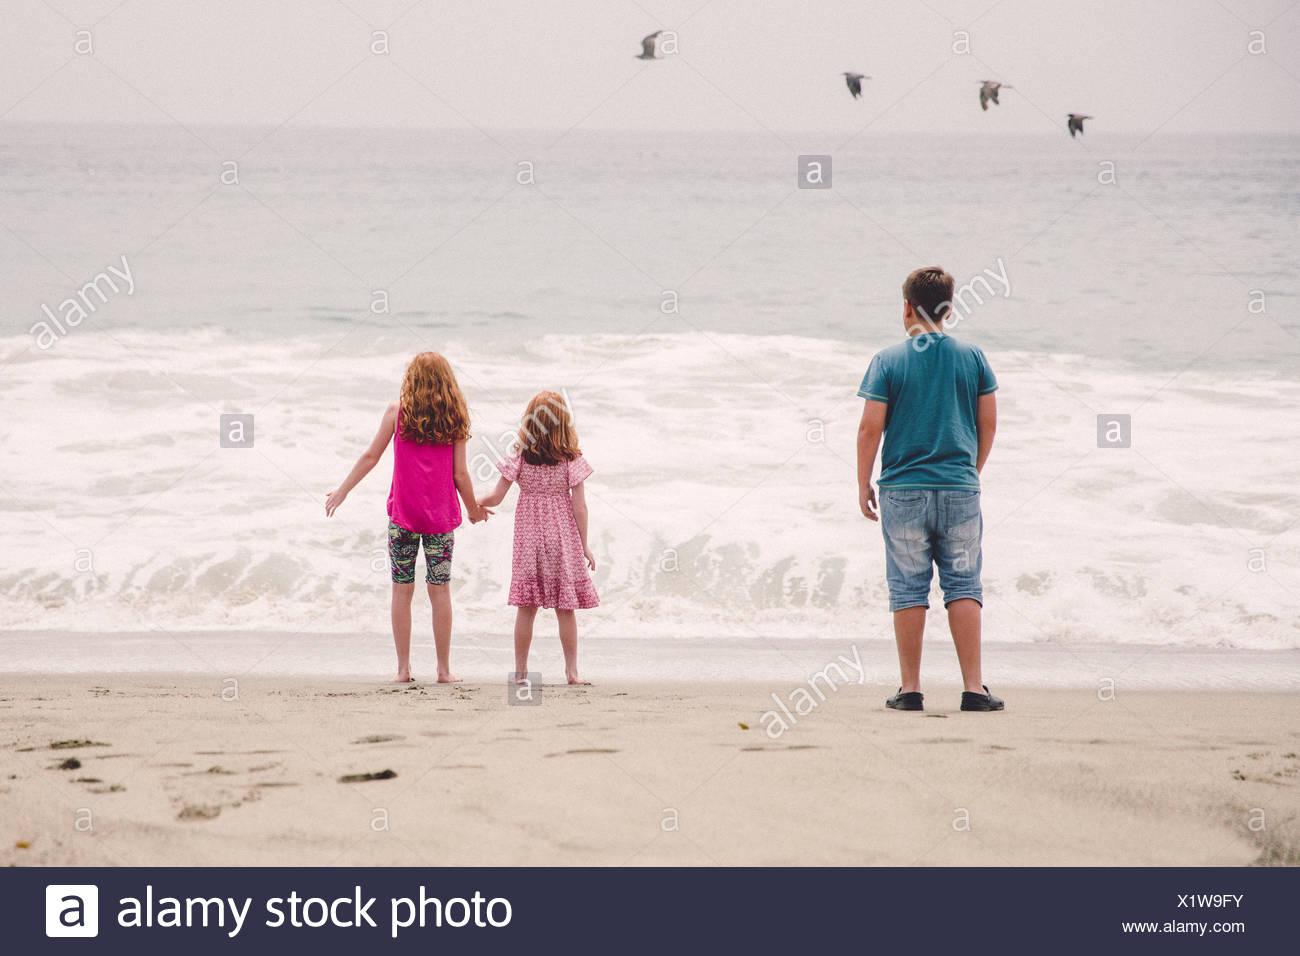 USA, California, Los Angeles, Kinder (6-7, 8-9, 12-13) gerade Wellen brechen sich am Strand Stockbild